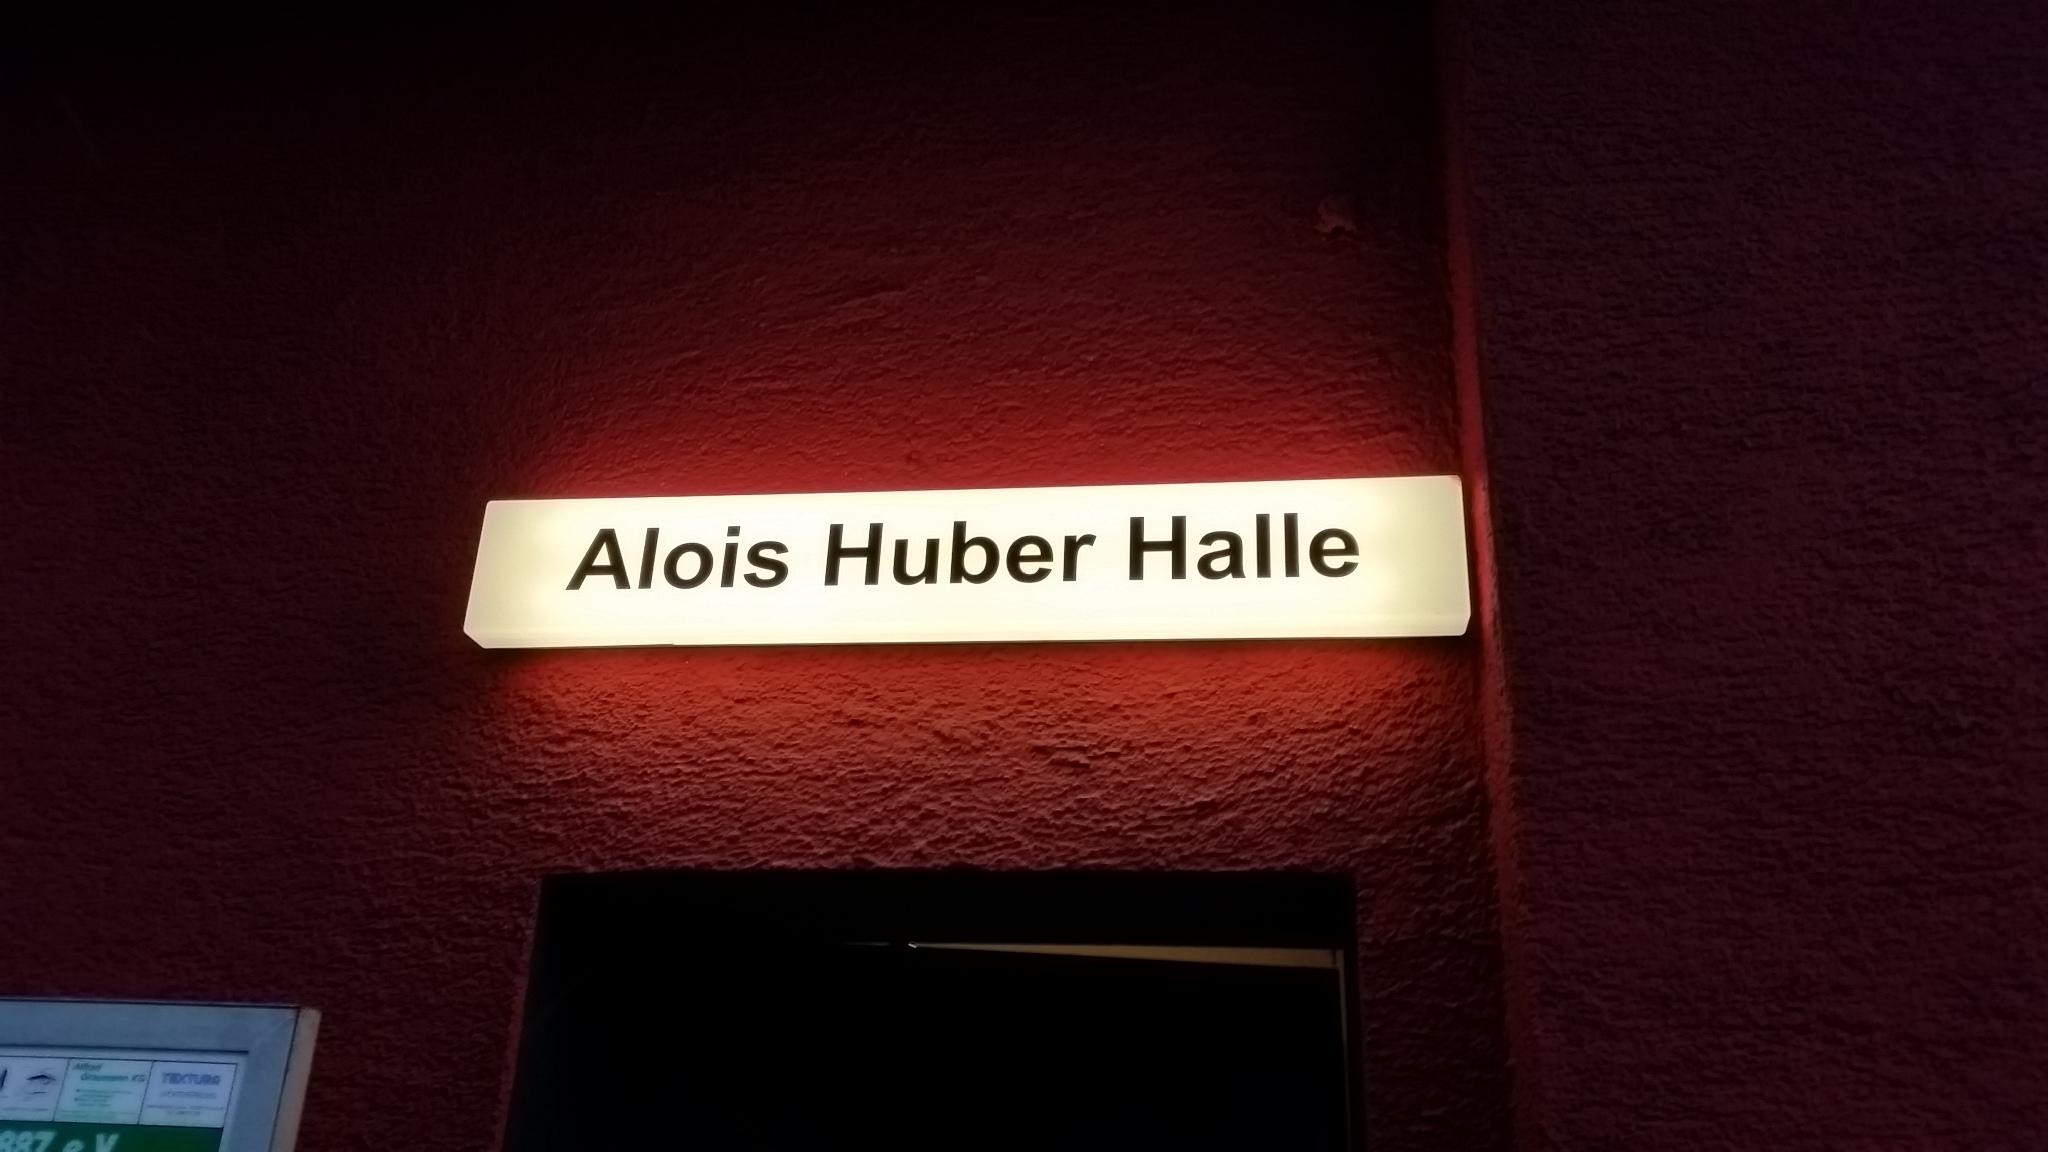 Alois Huber Halle